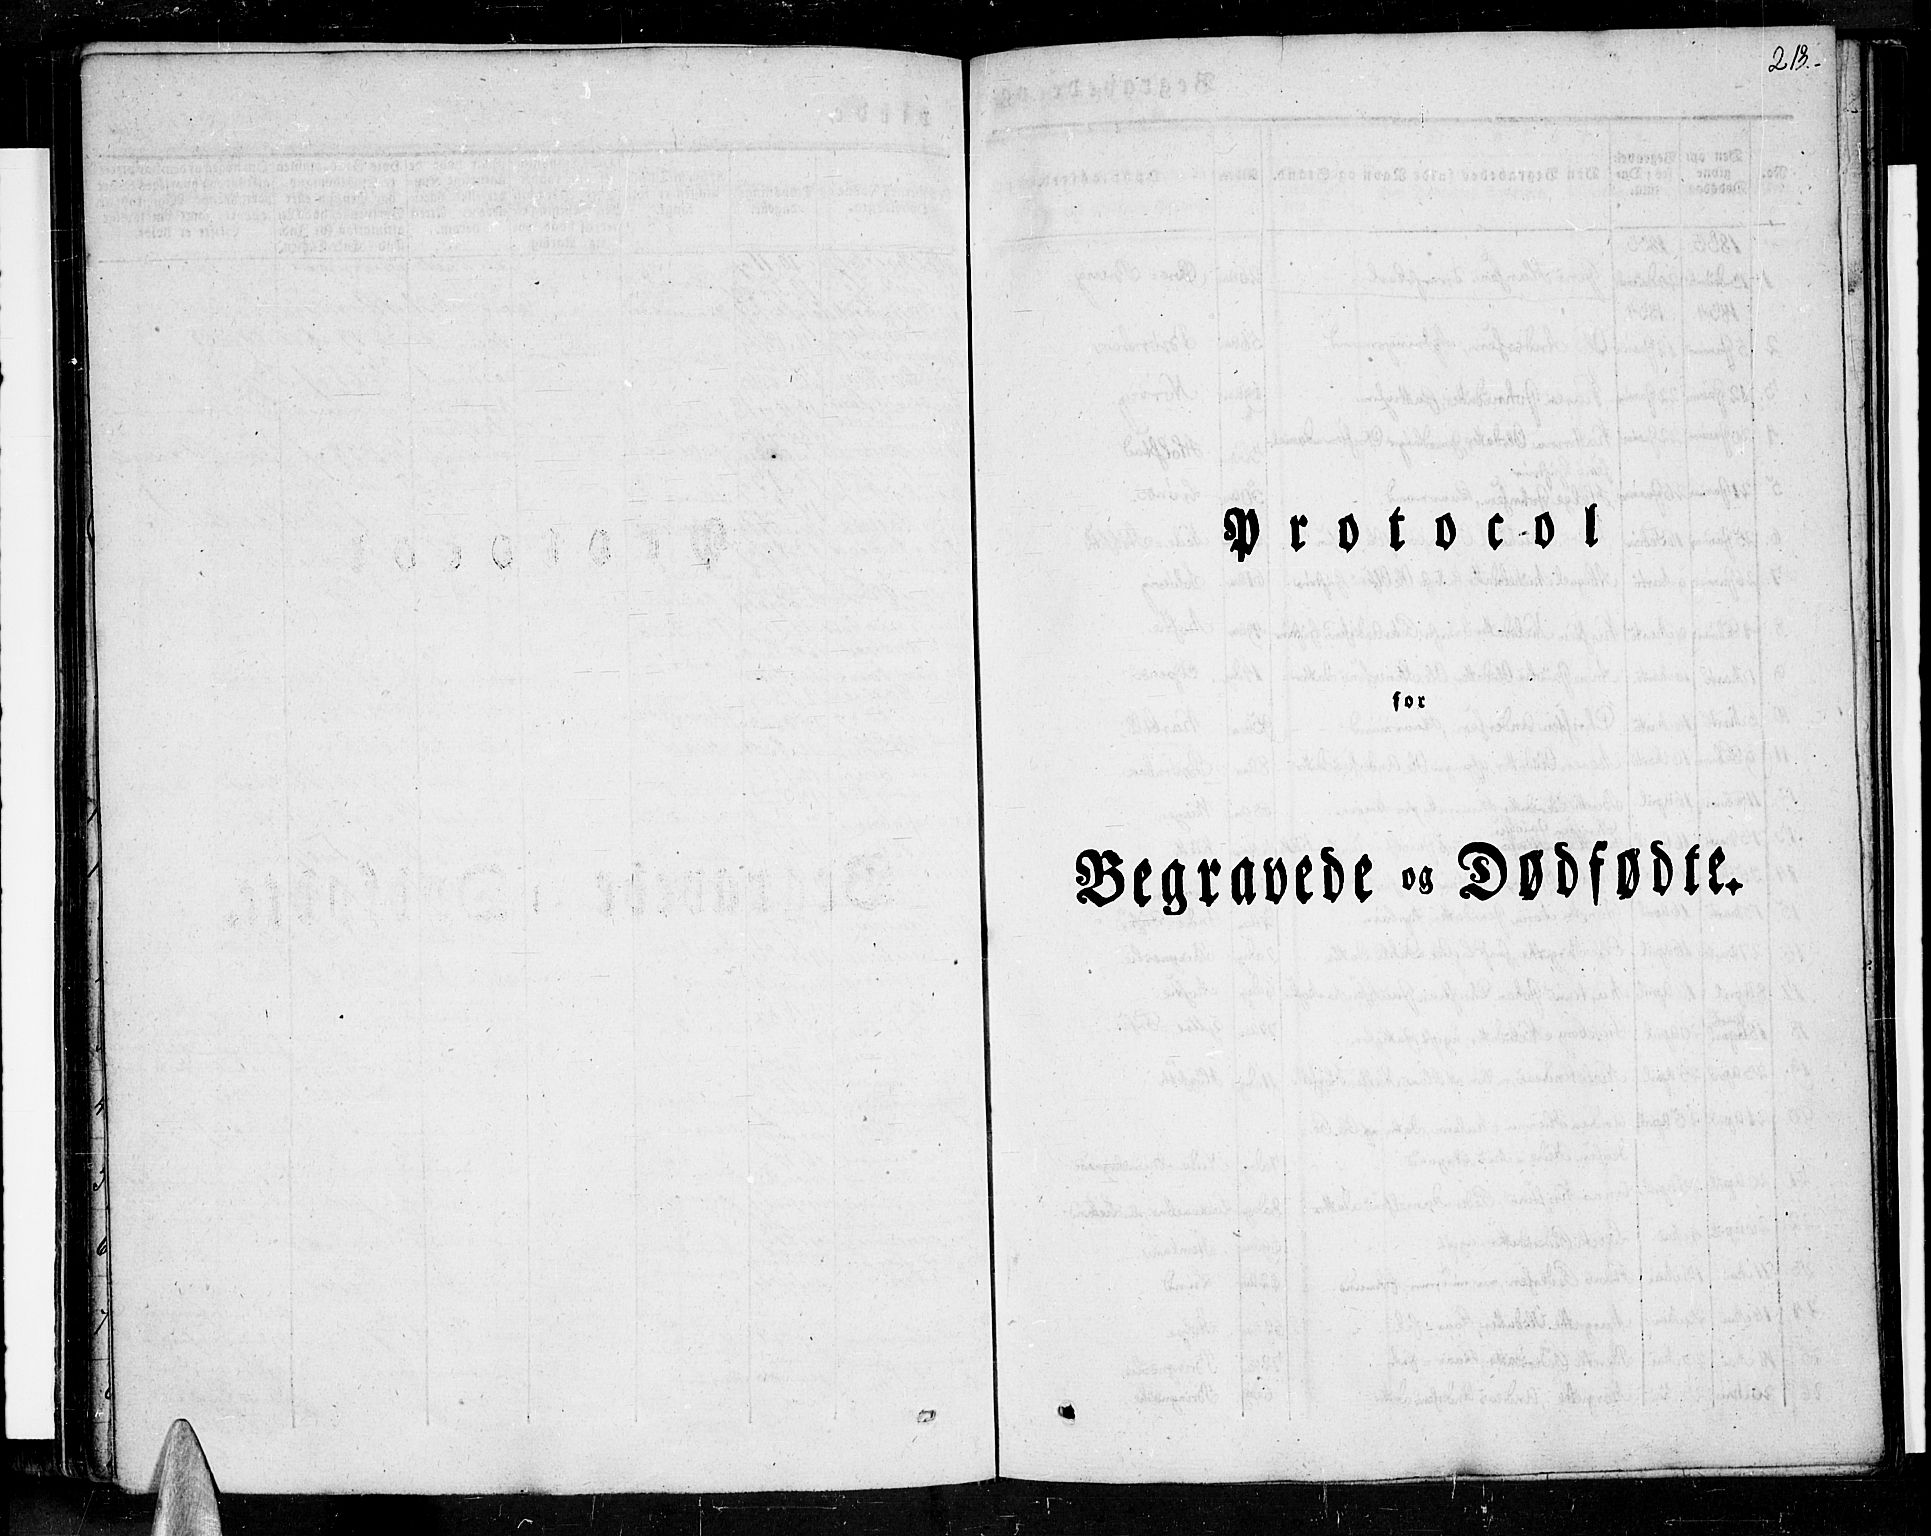 SAT, Ministerialprotokoller, klokkerbøker og fødselsregistre - Nordland, 852/L0737: Ministerialbok nr. 852A07, 1833-1849, s. 213